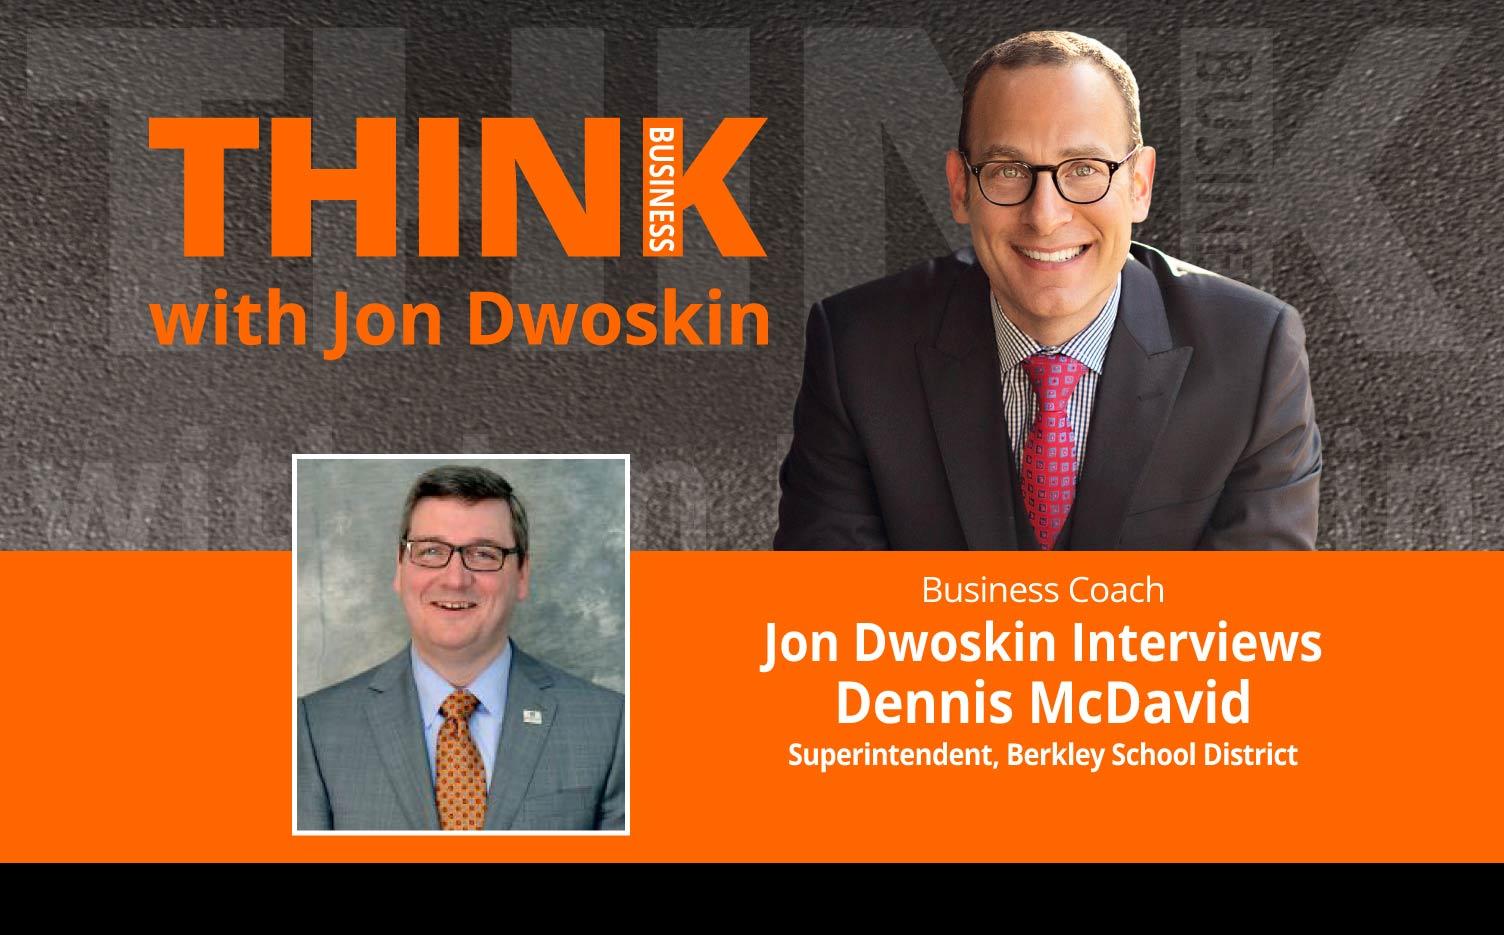 THINK Business Podcast: Jon Dwoskin Interviews Dennis McDavid, Superintendent, Berkley School District